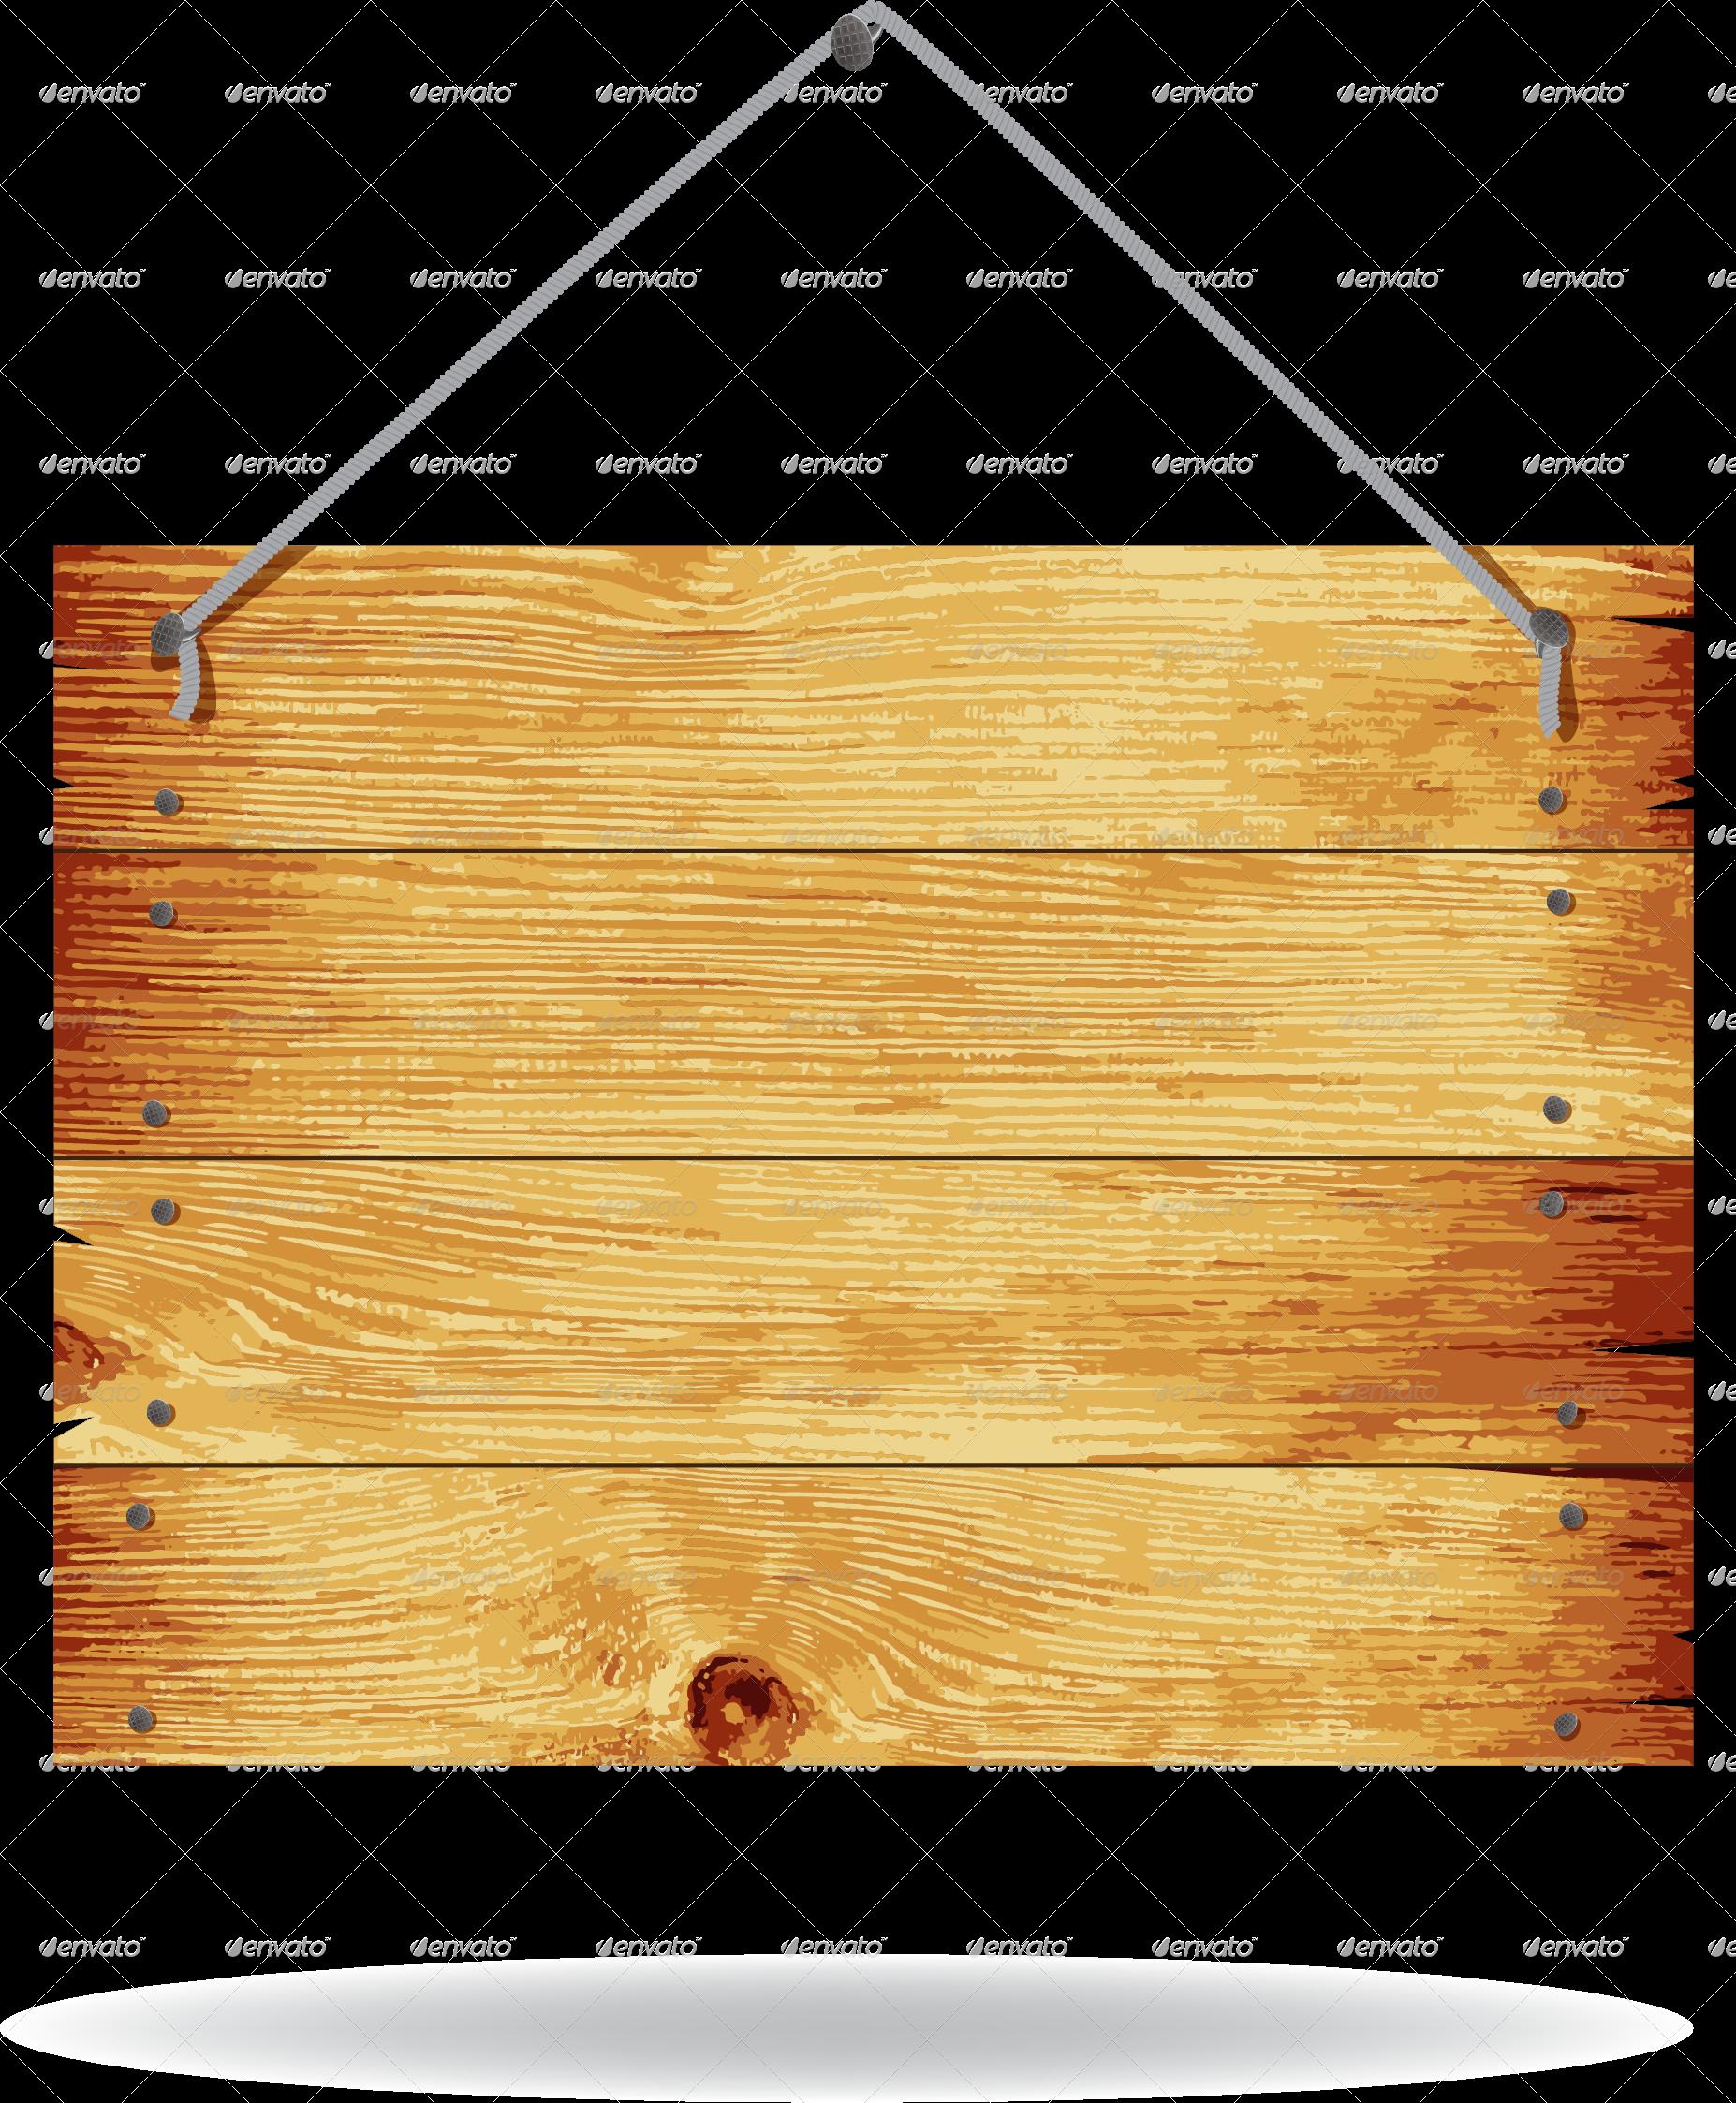 Wood sign transparent png pictures free icons and png for Plaque de plexiglas transparent castorama